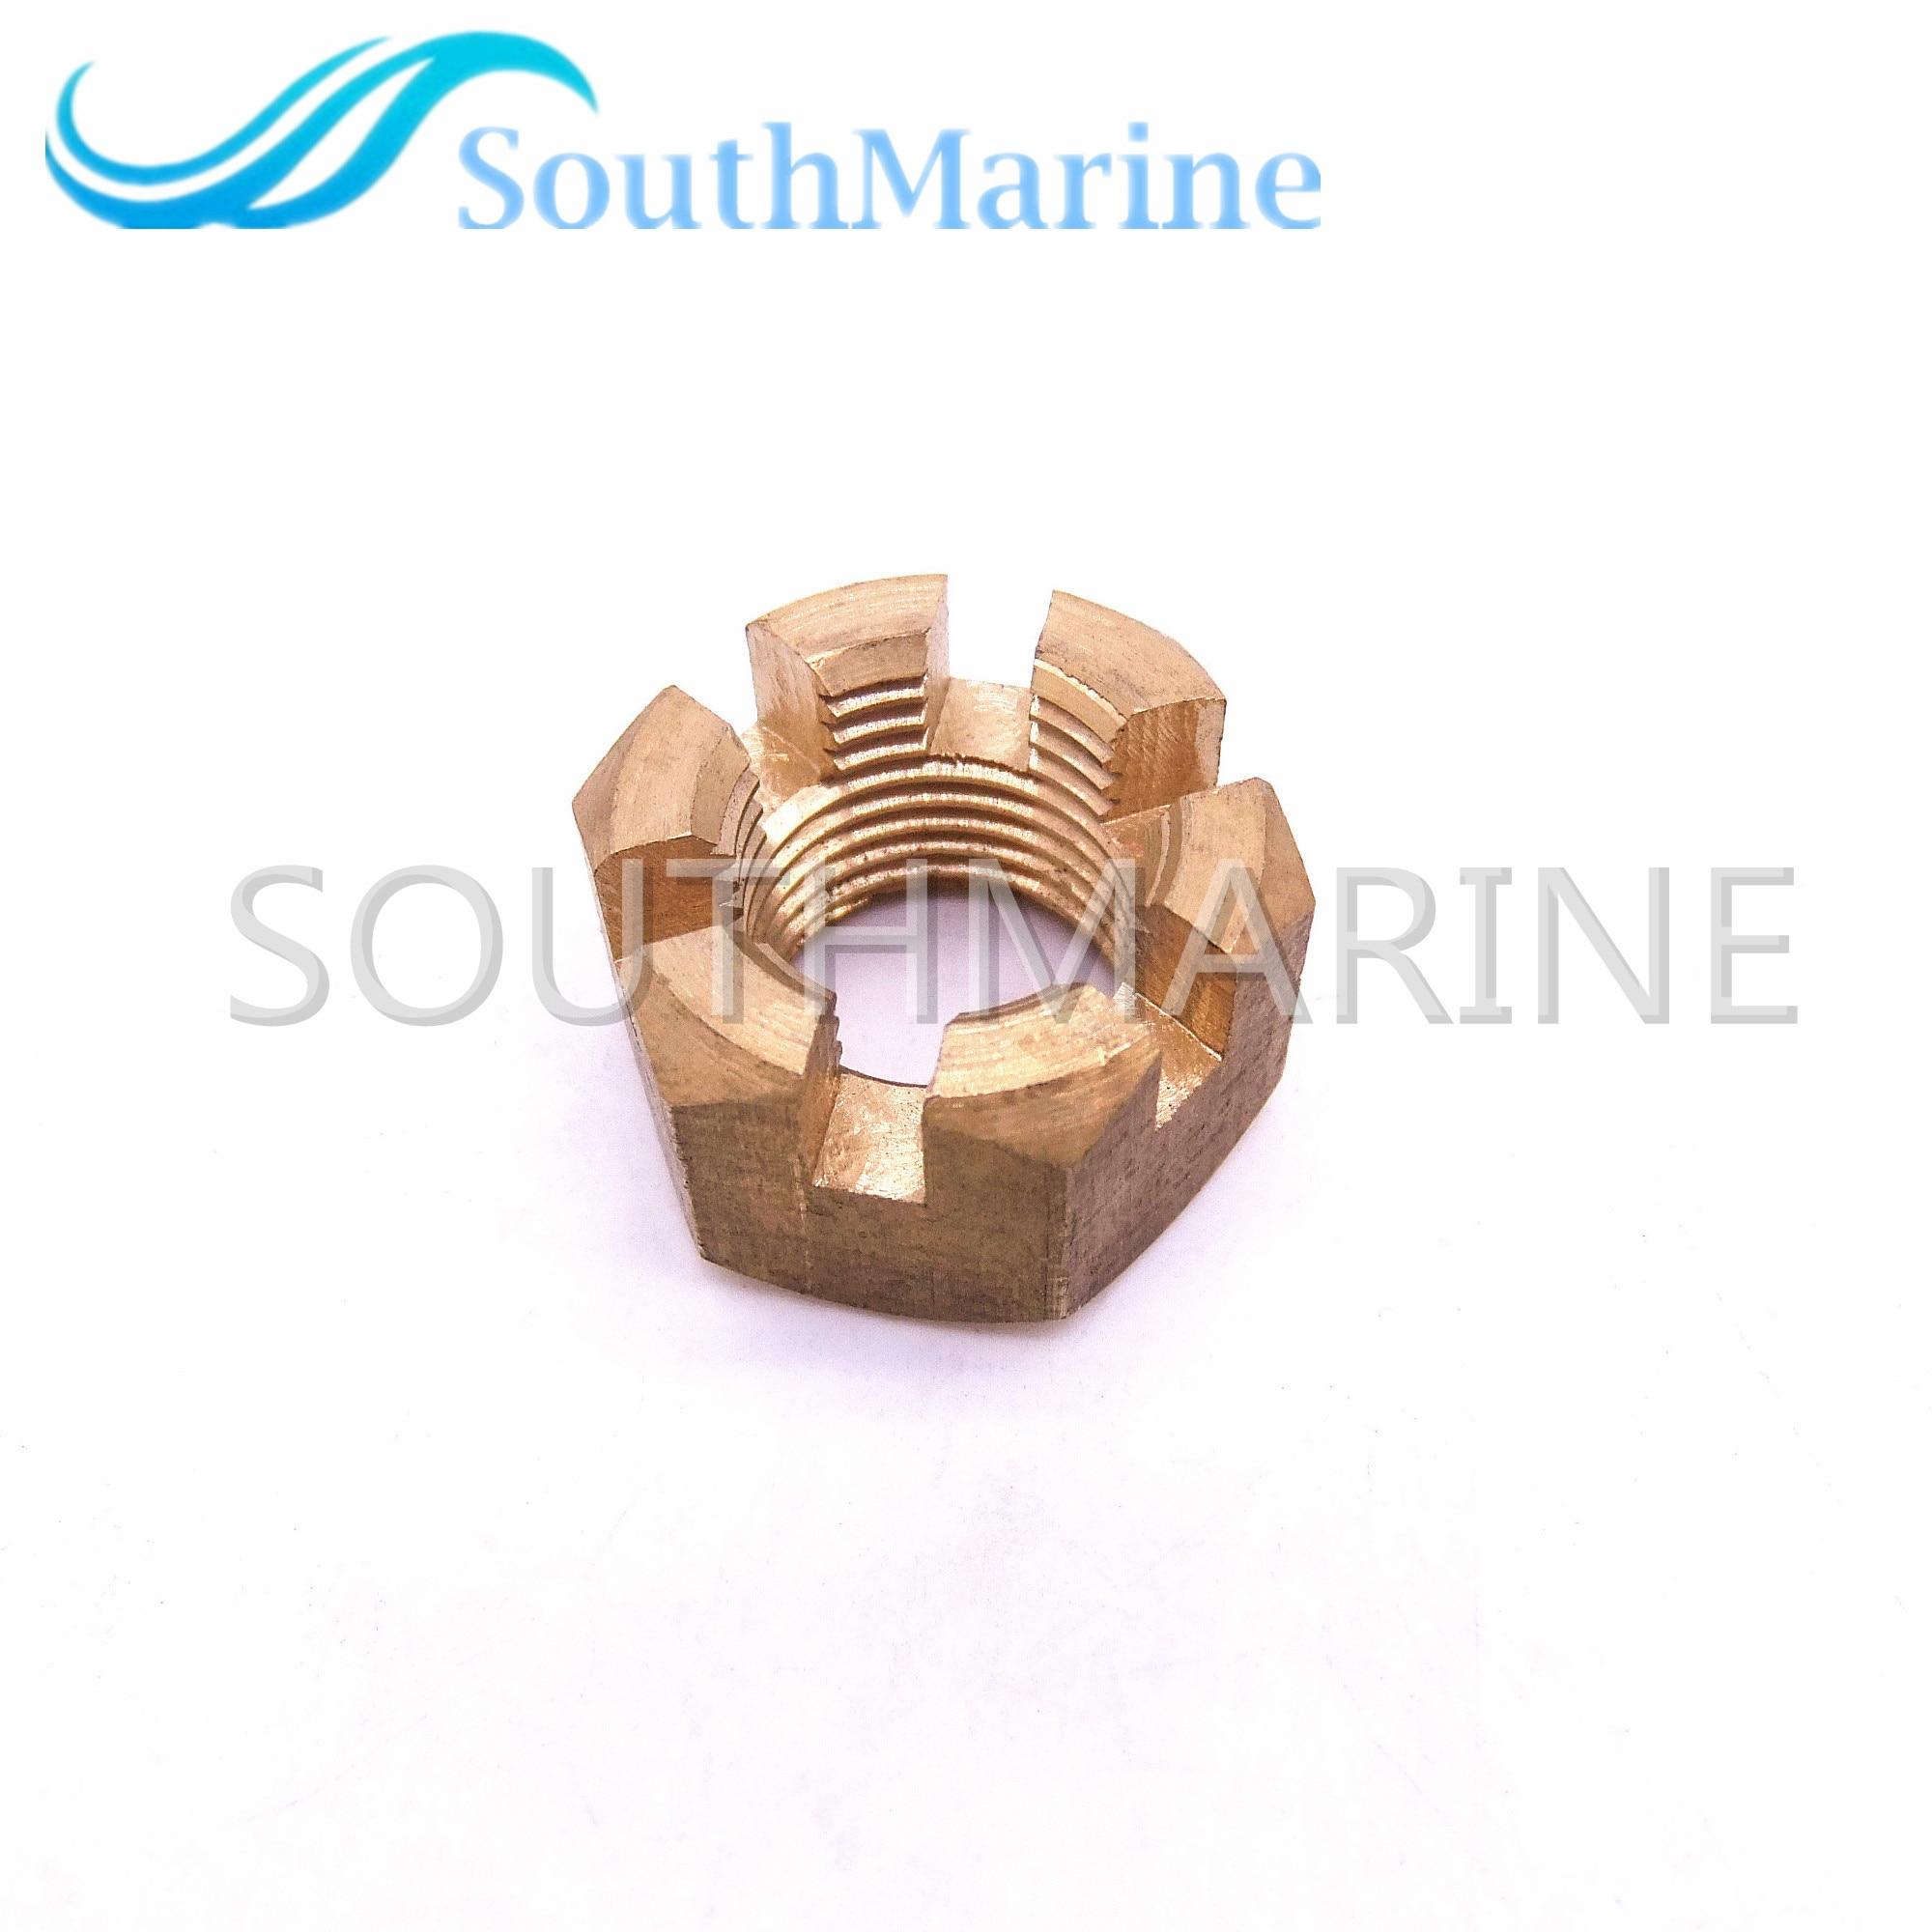 Peças de Motores Marítimos de popa 90171-16011 Porca, Castelo de hélice para Yamaha 40HP 50HP 90HP 55HP 60HP 70HP, frete Grátis